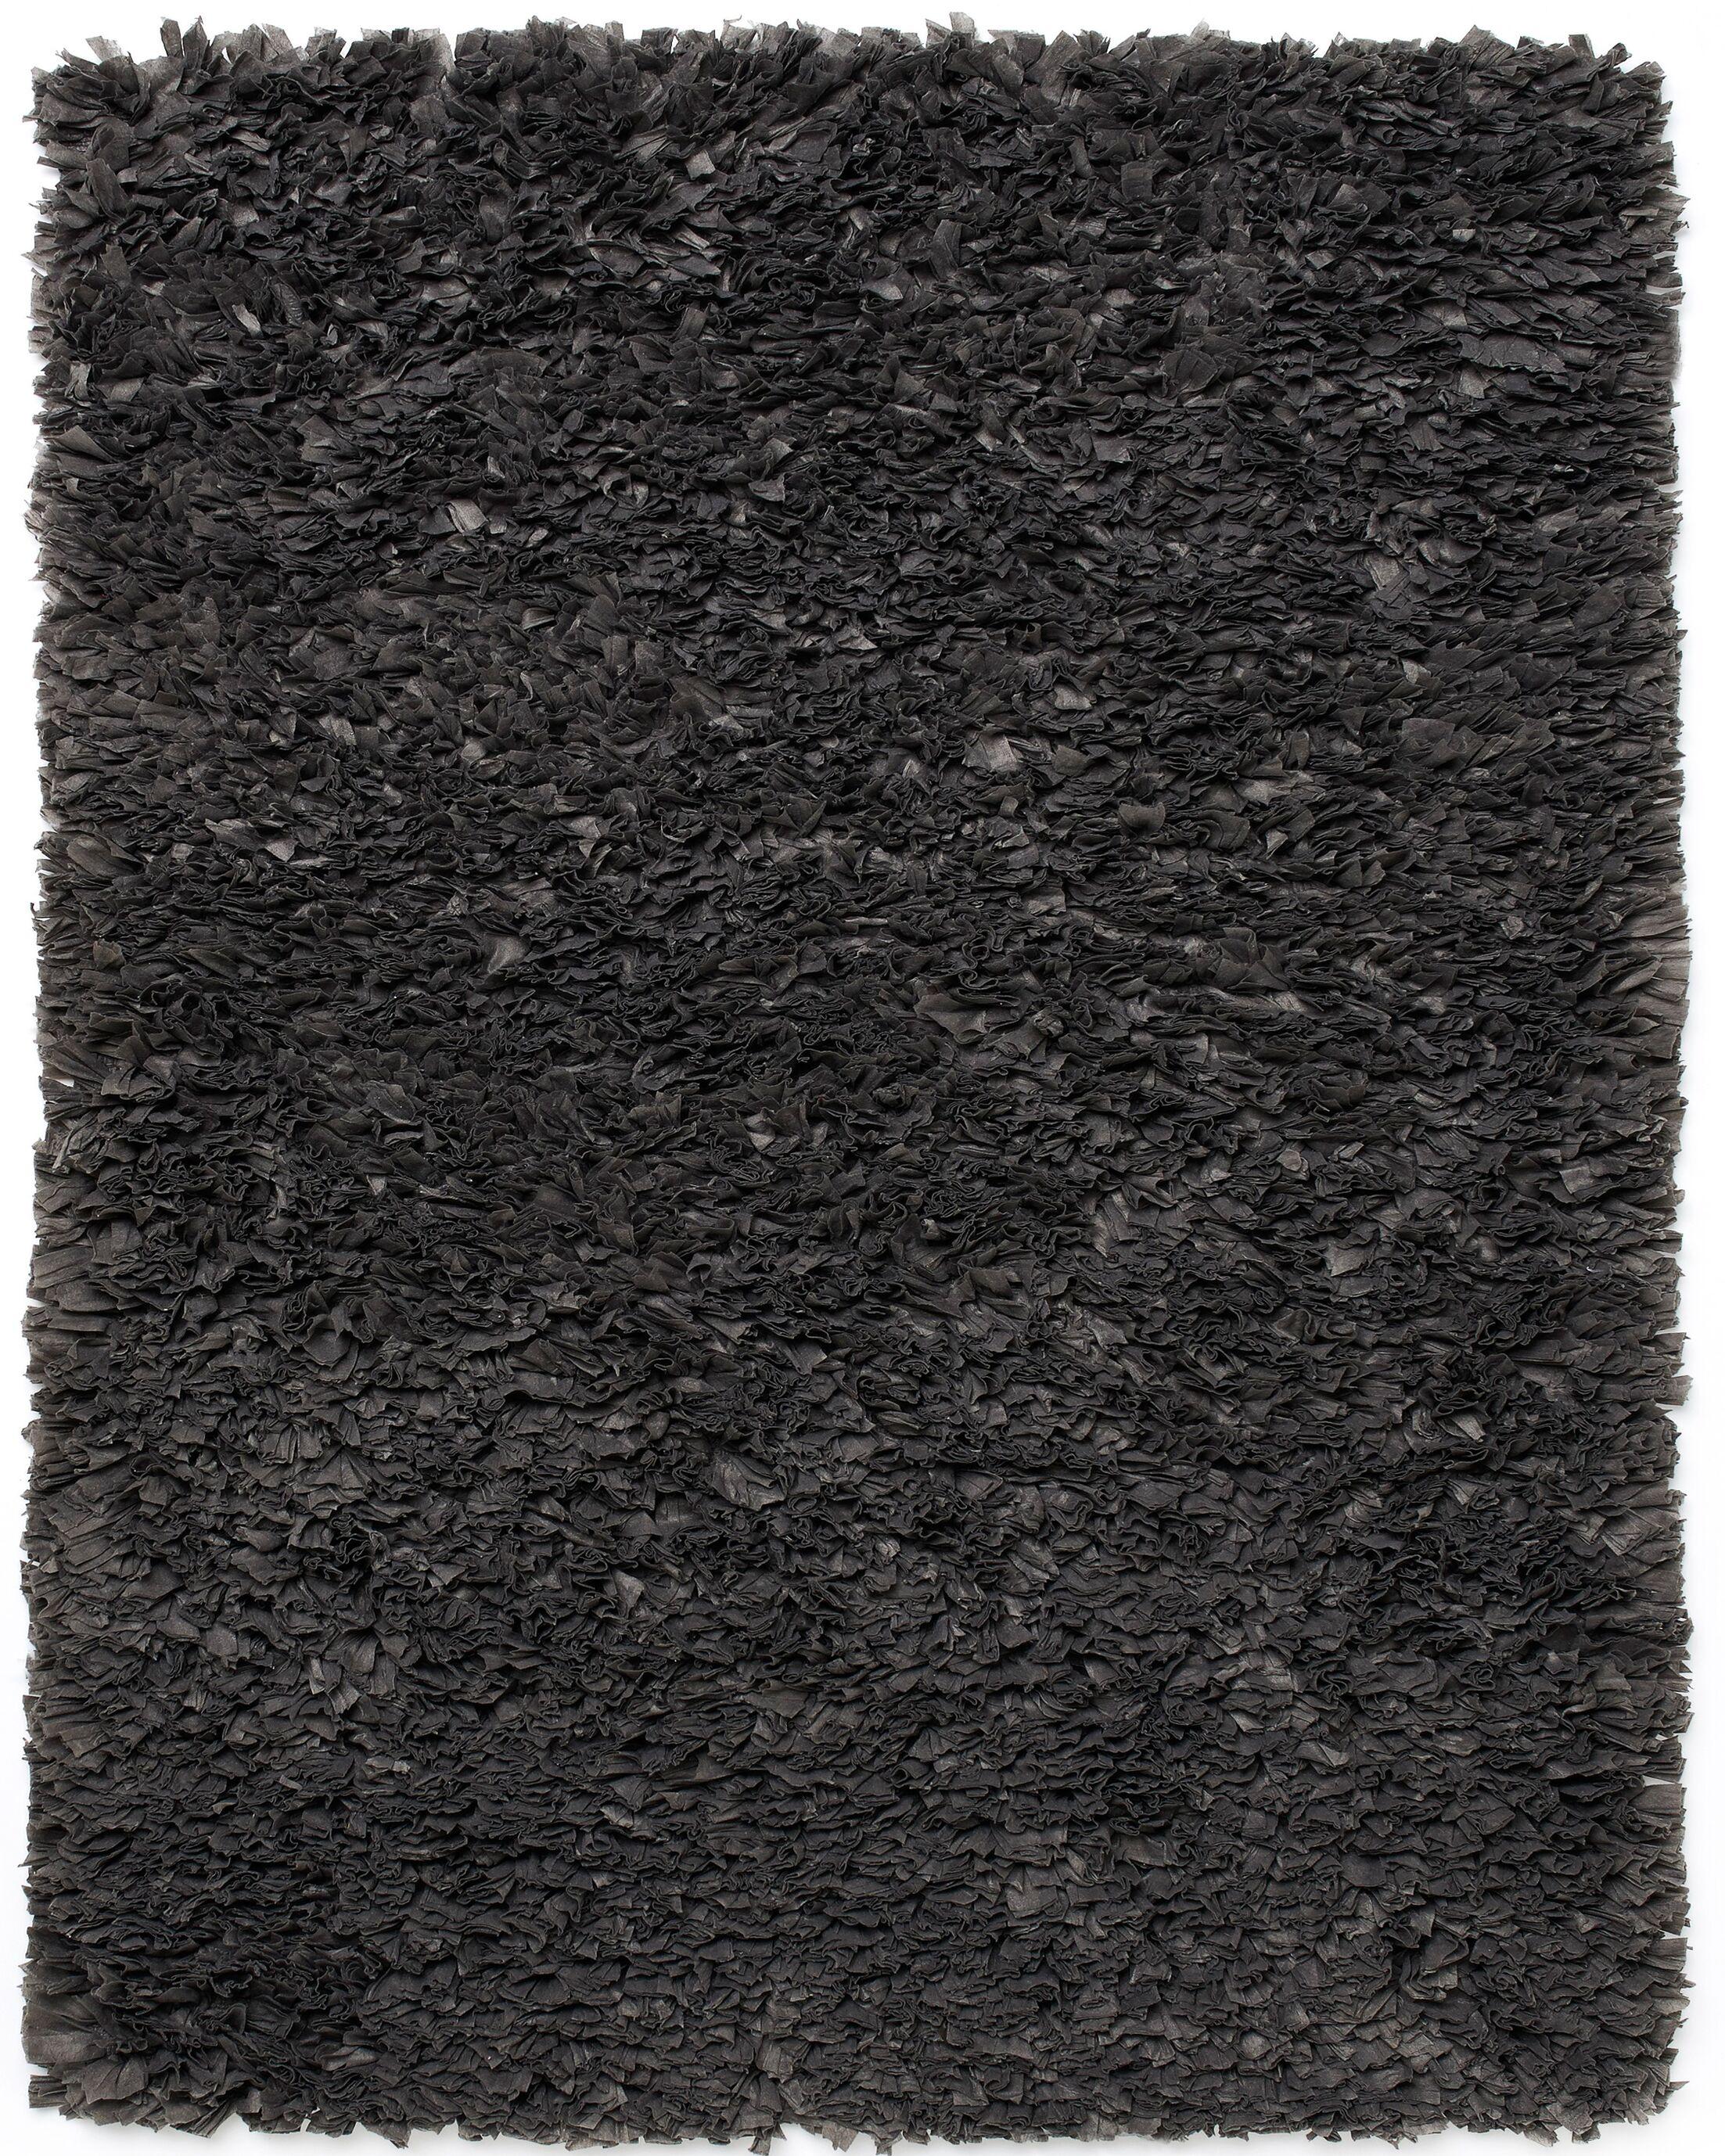 Geralynn Gray Area Rug Rug Size: 4' x 6'